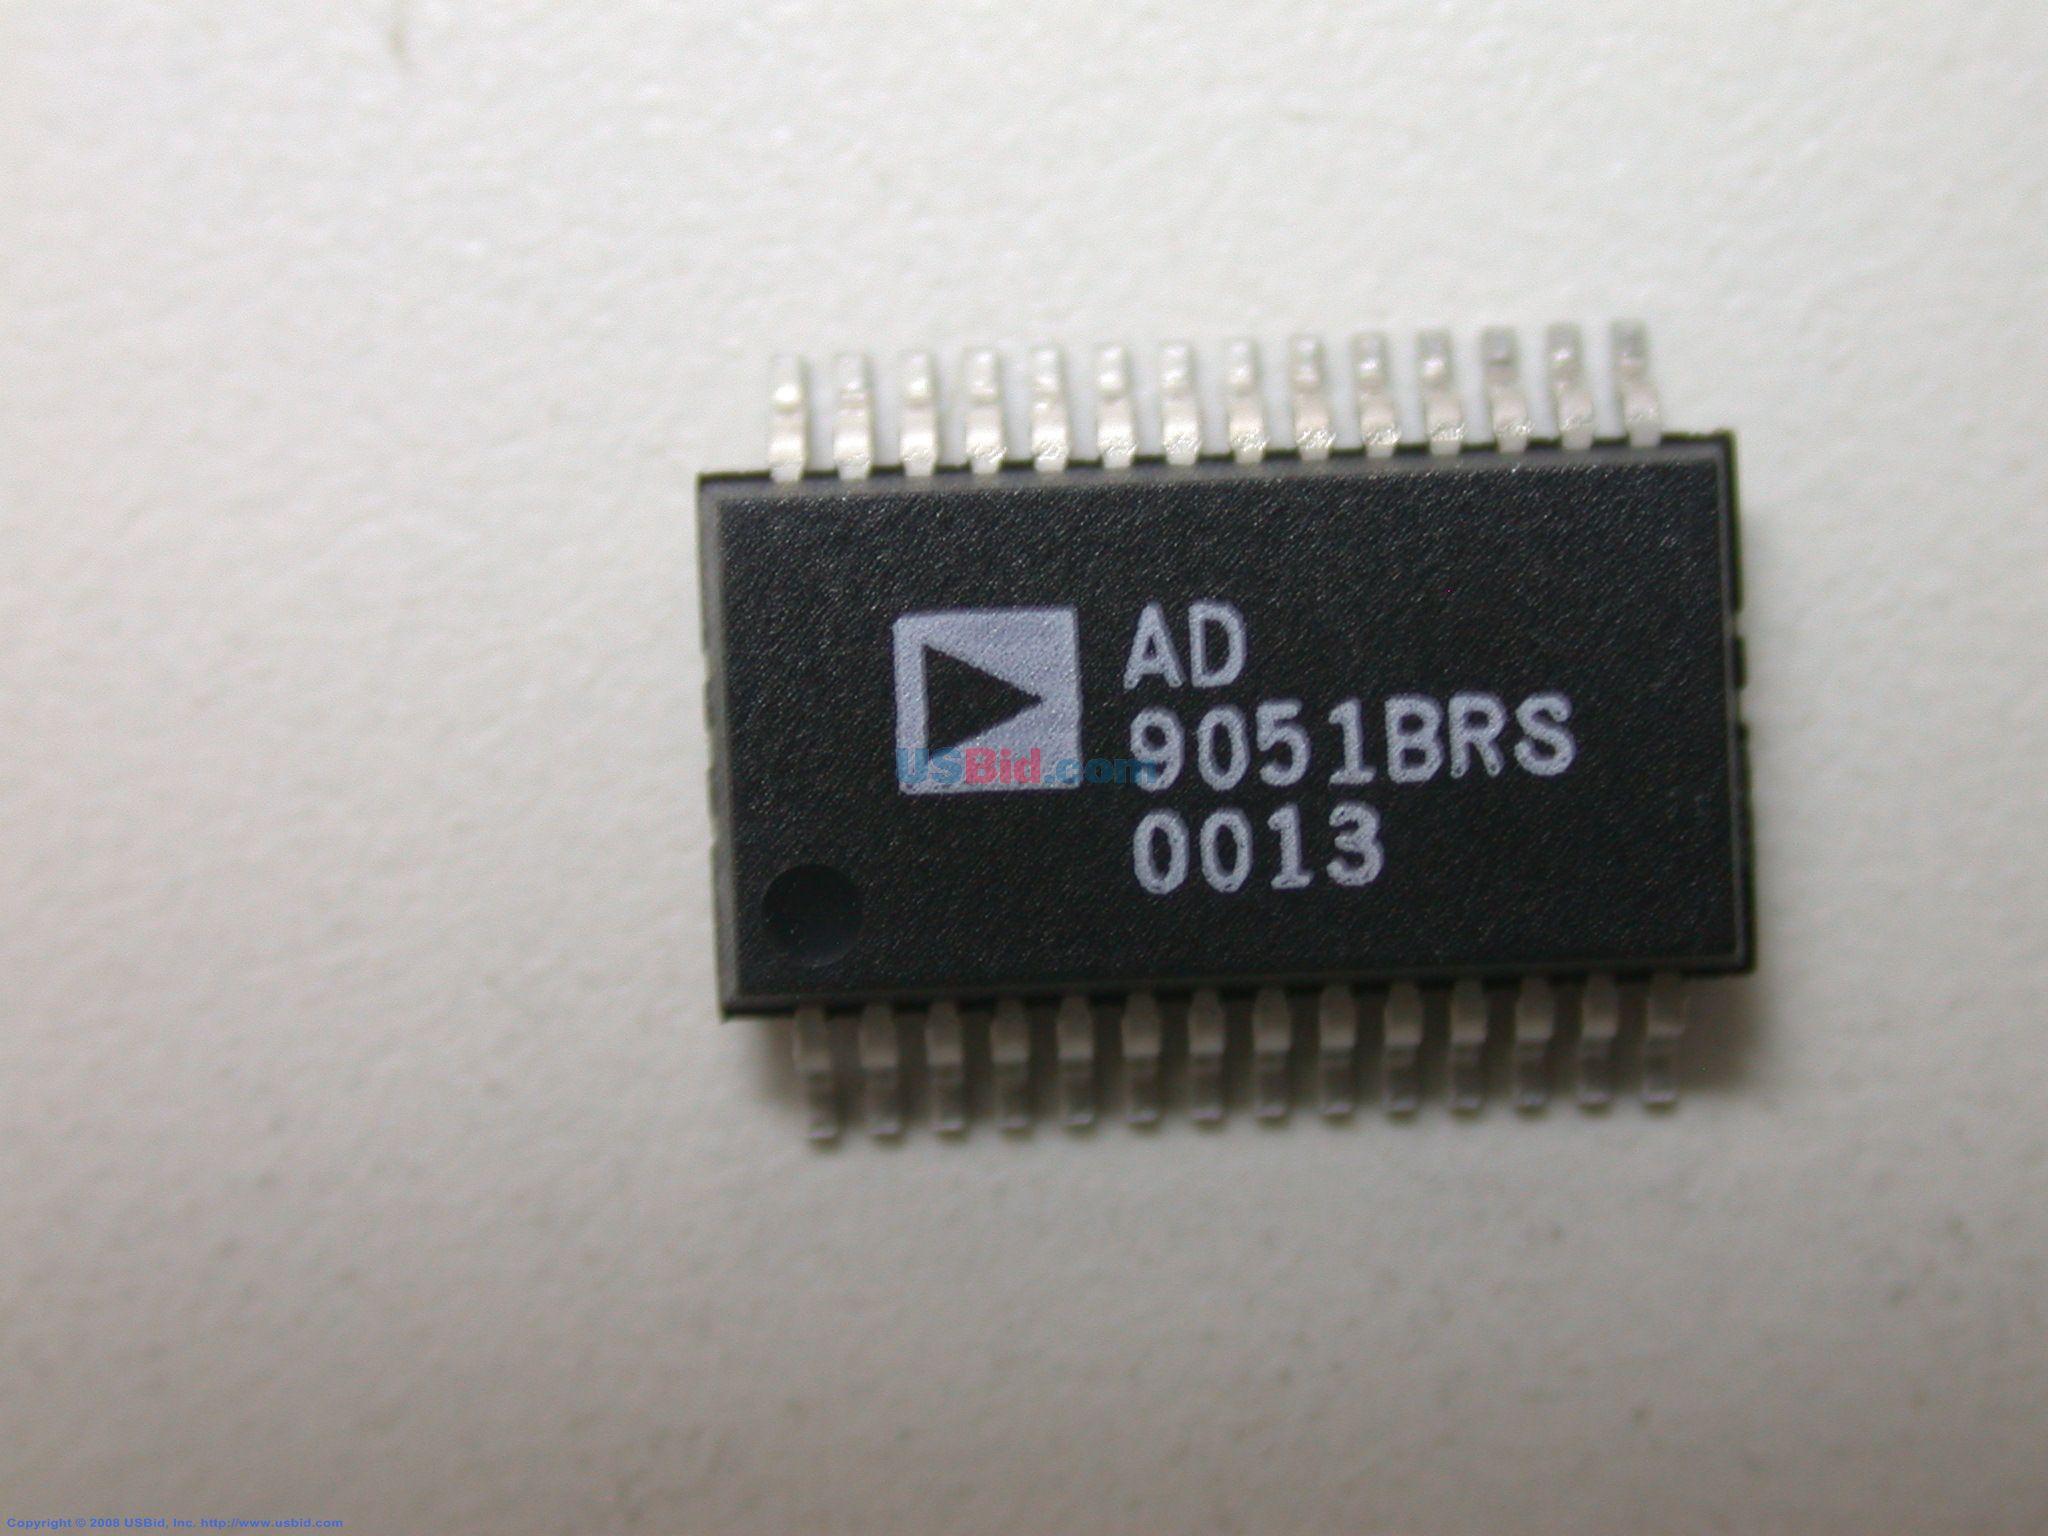 AD9051BRS photos